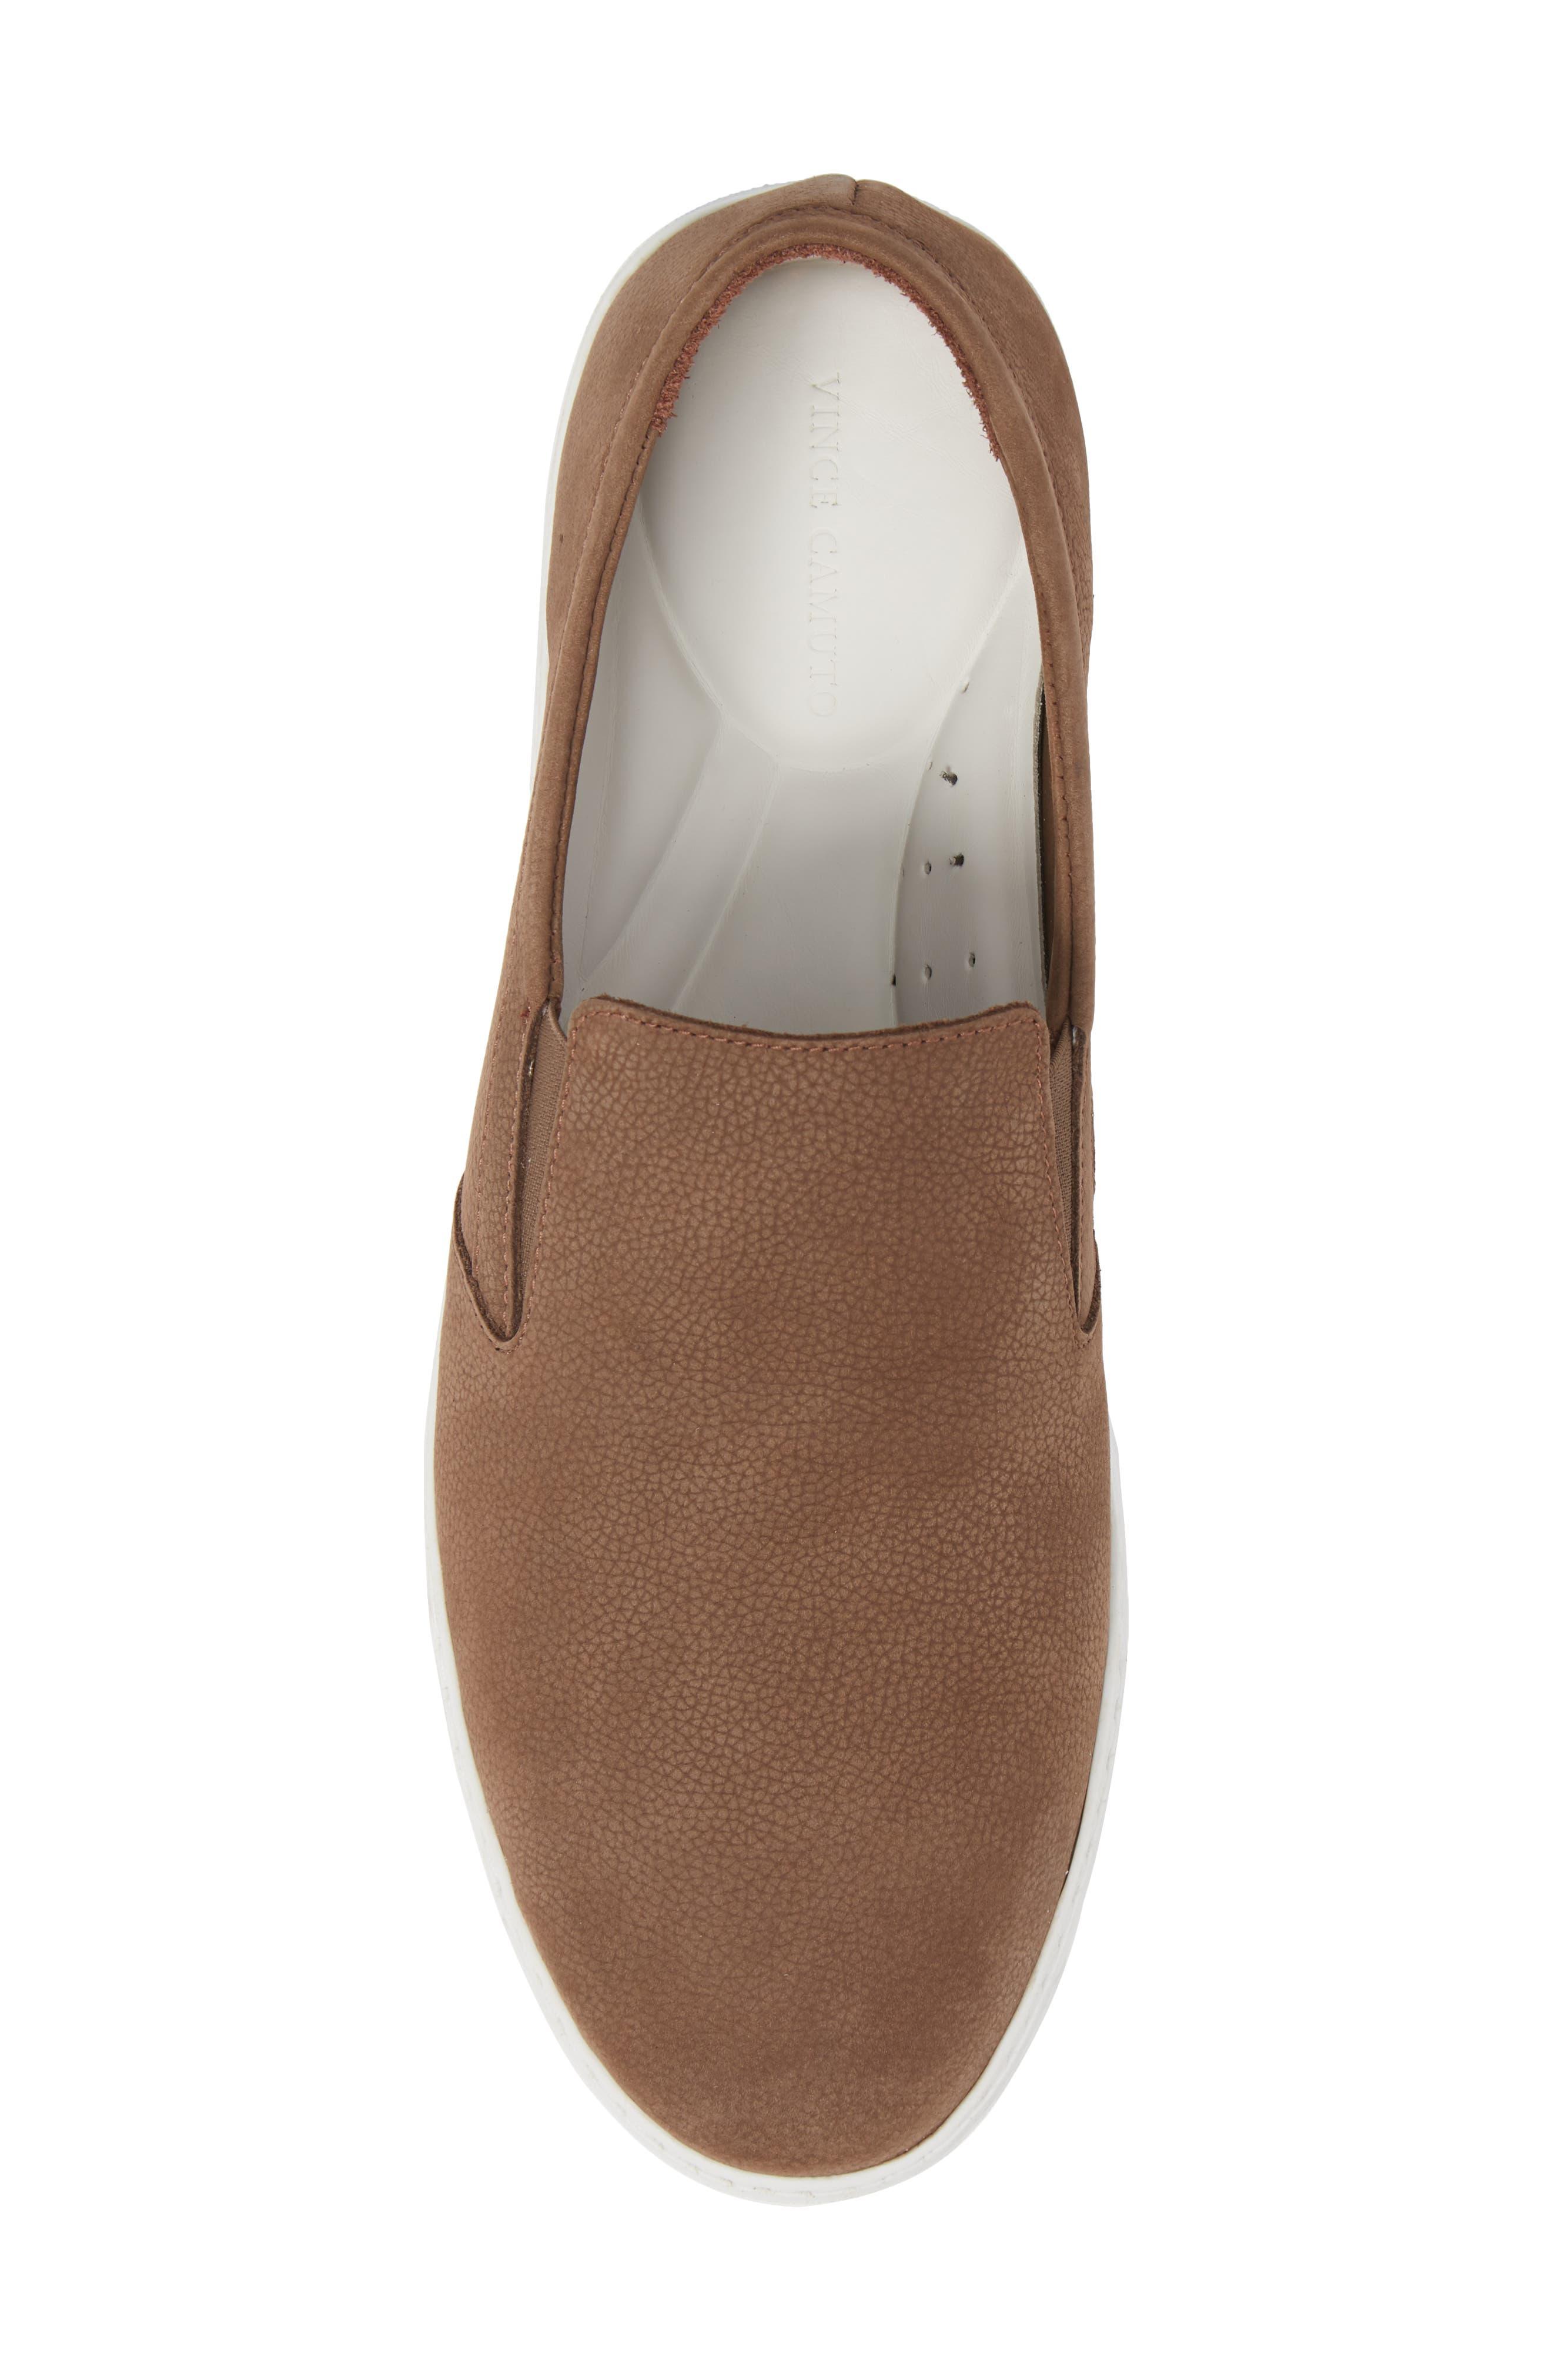 Neff Slip-On Sneaker,                             Alternate thumbnail 5, color,                             Taupe Leather